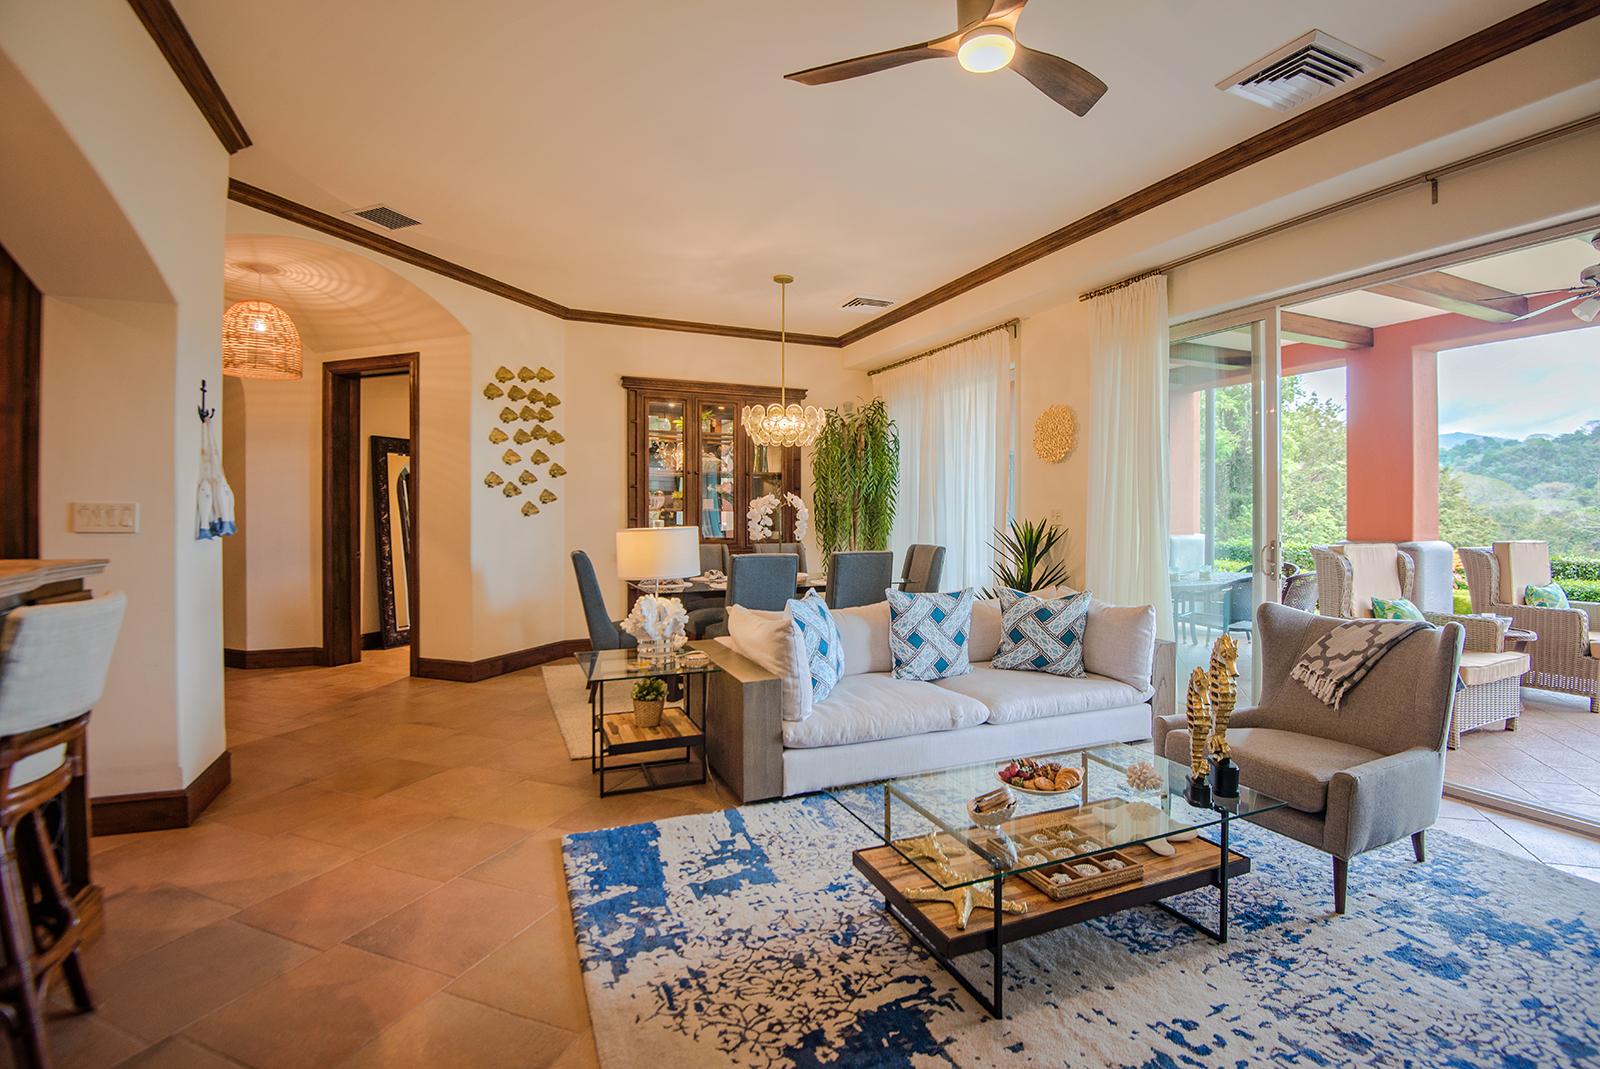 Montebello 4E- Fully Furnished Luxury Garden Level Condominium Located In The Most Exclusive Community